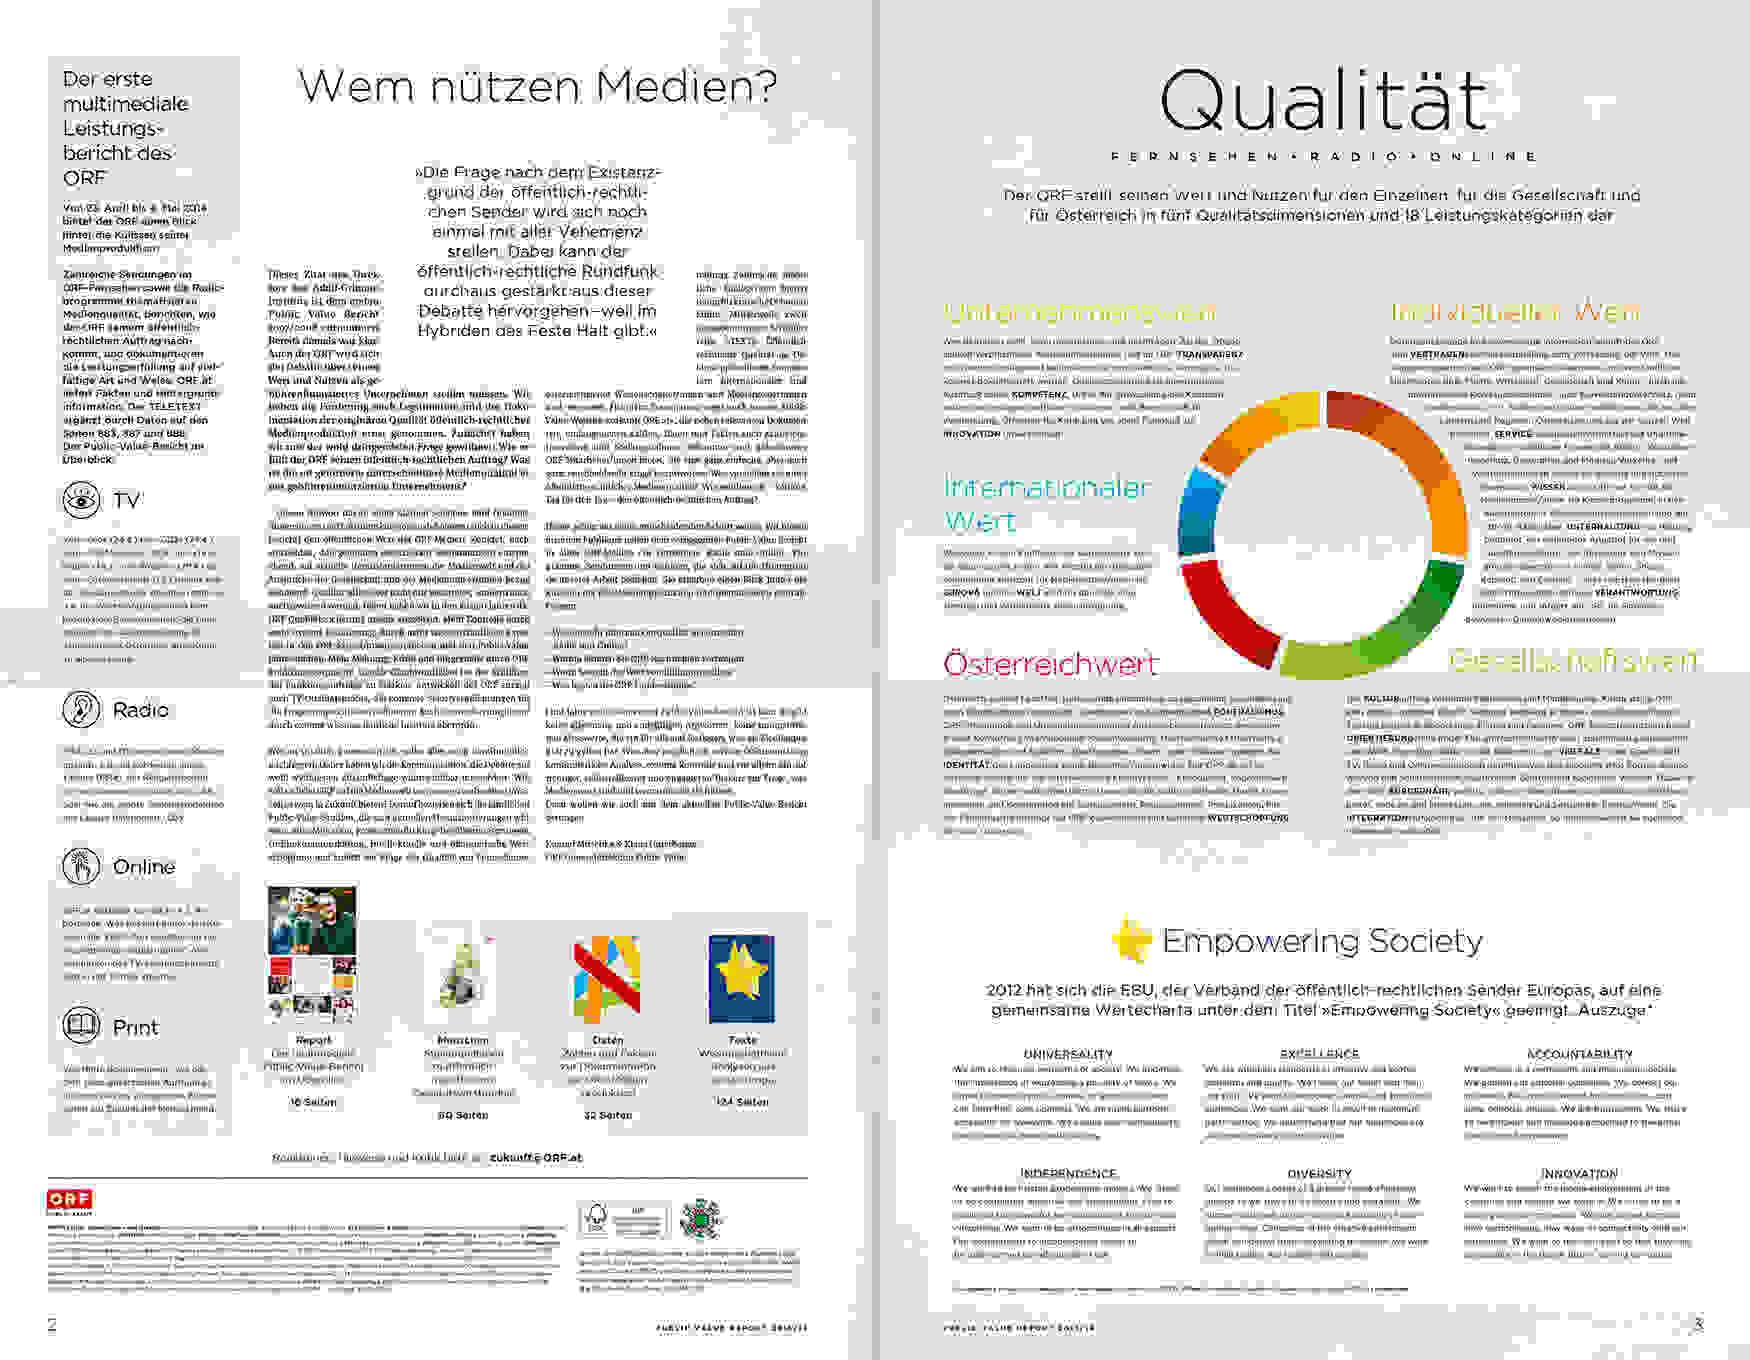 ORF PV 2014 Zeitung Doppelseite 1